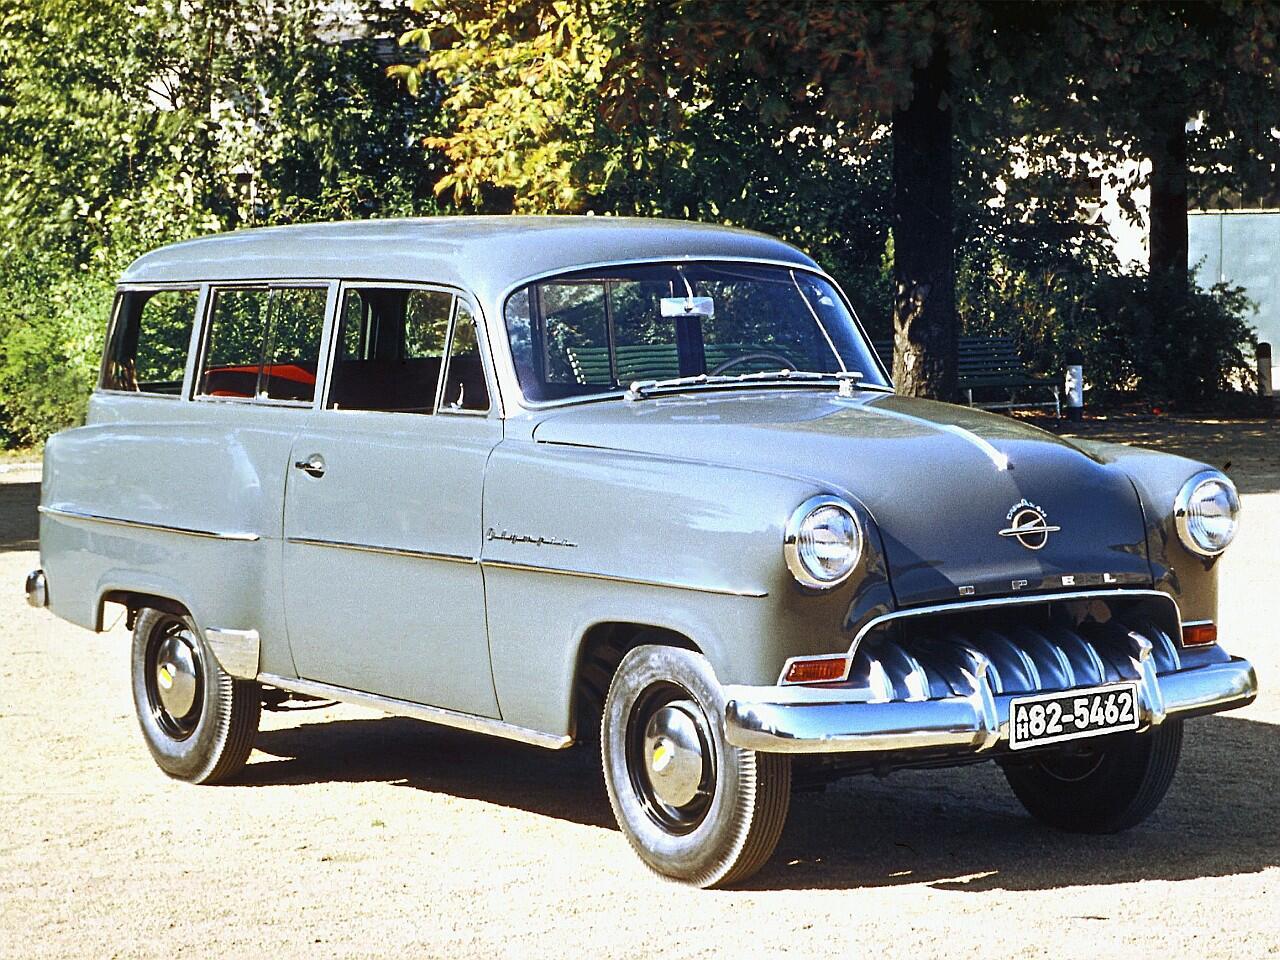 Bild zu Opel Olympia Rekord 1953 bis 1954